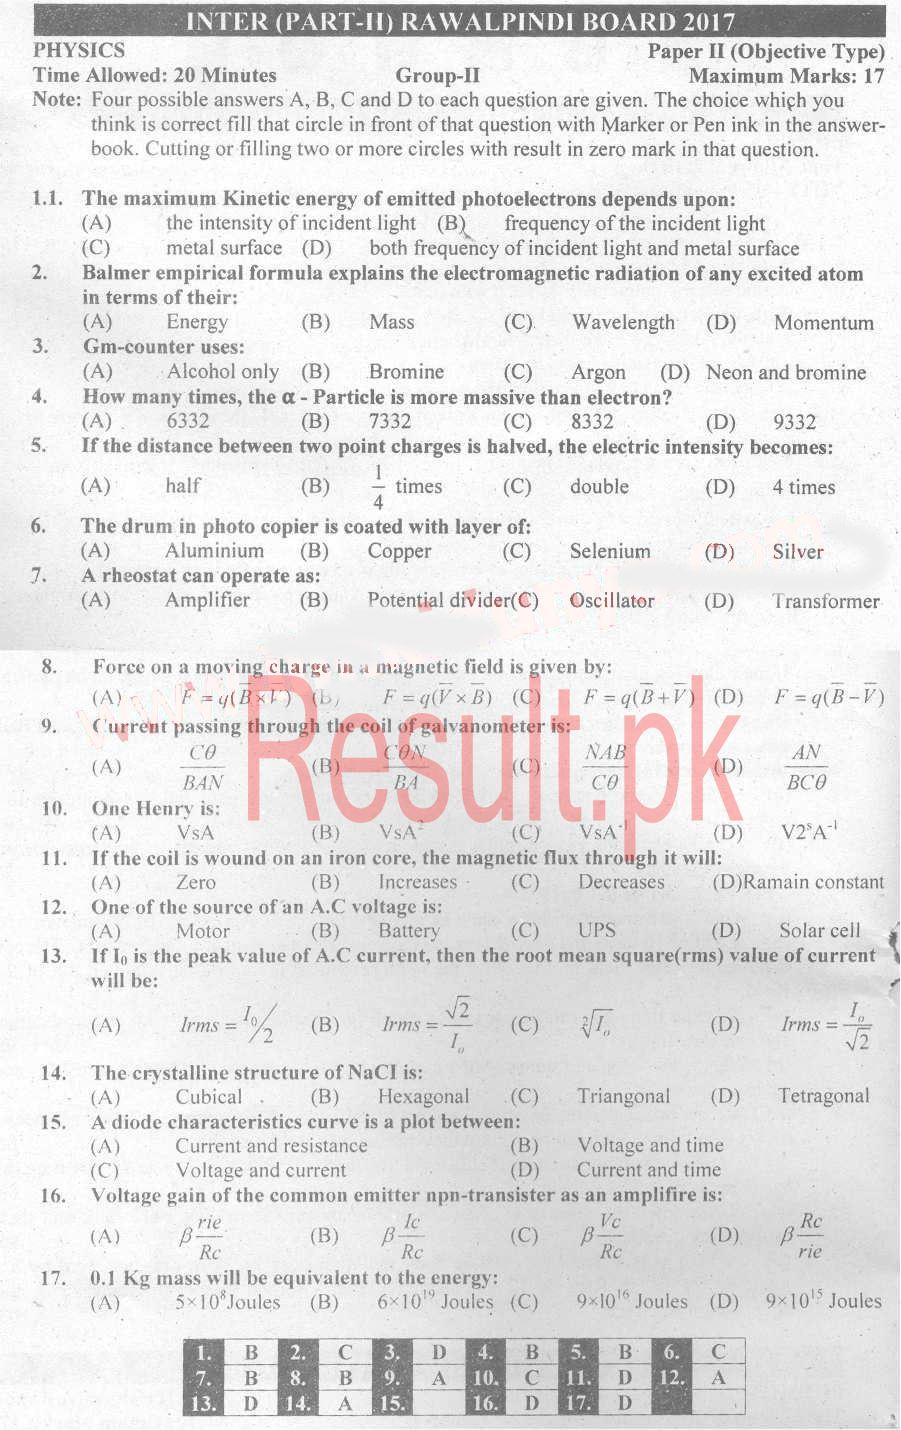 BISE Rawalpindi Board Past Papers 2019 Inter Part 1 2, FA